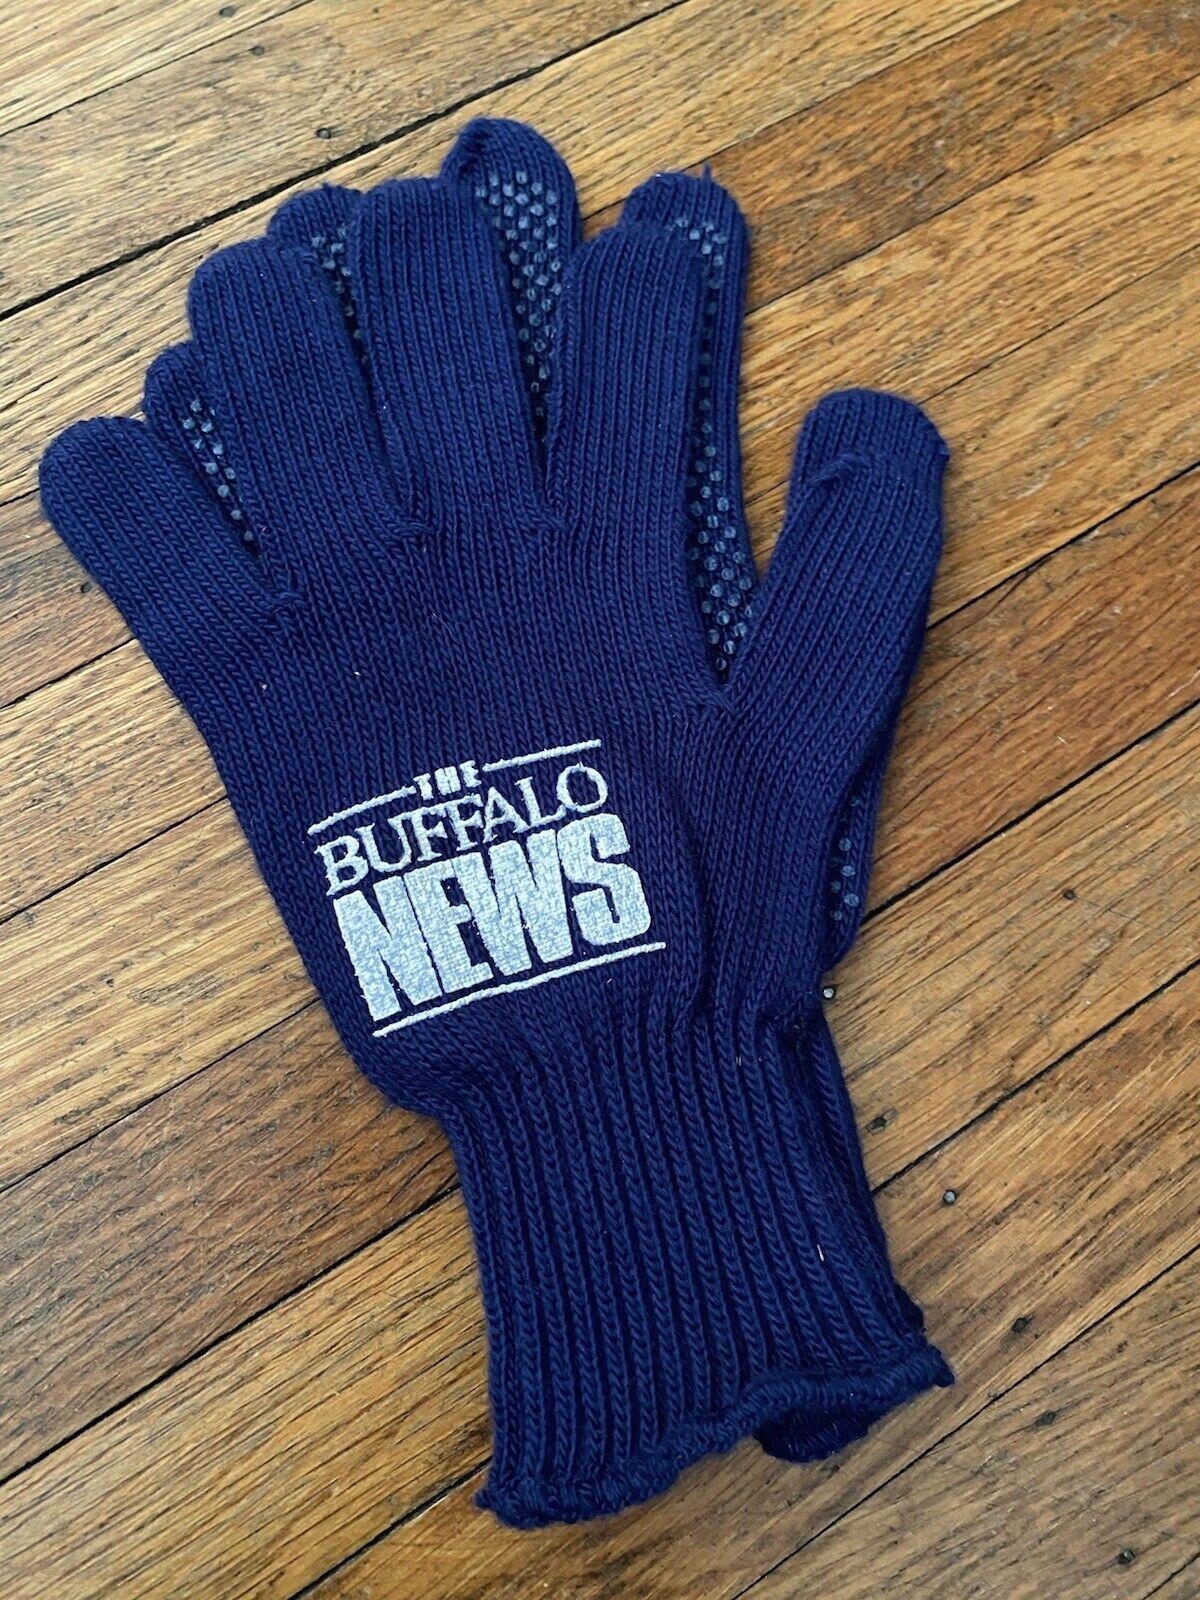 Vintage The Buffalo News Gloves - Buffalo, New York - Deadstock 1990s